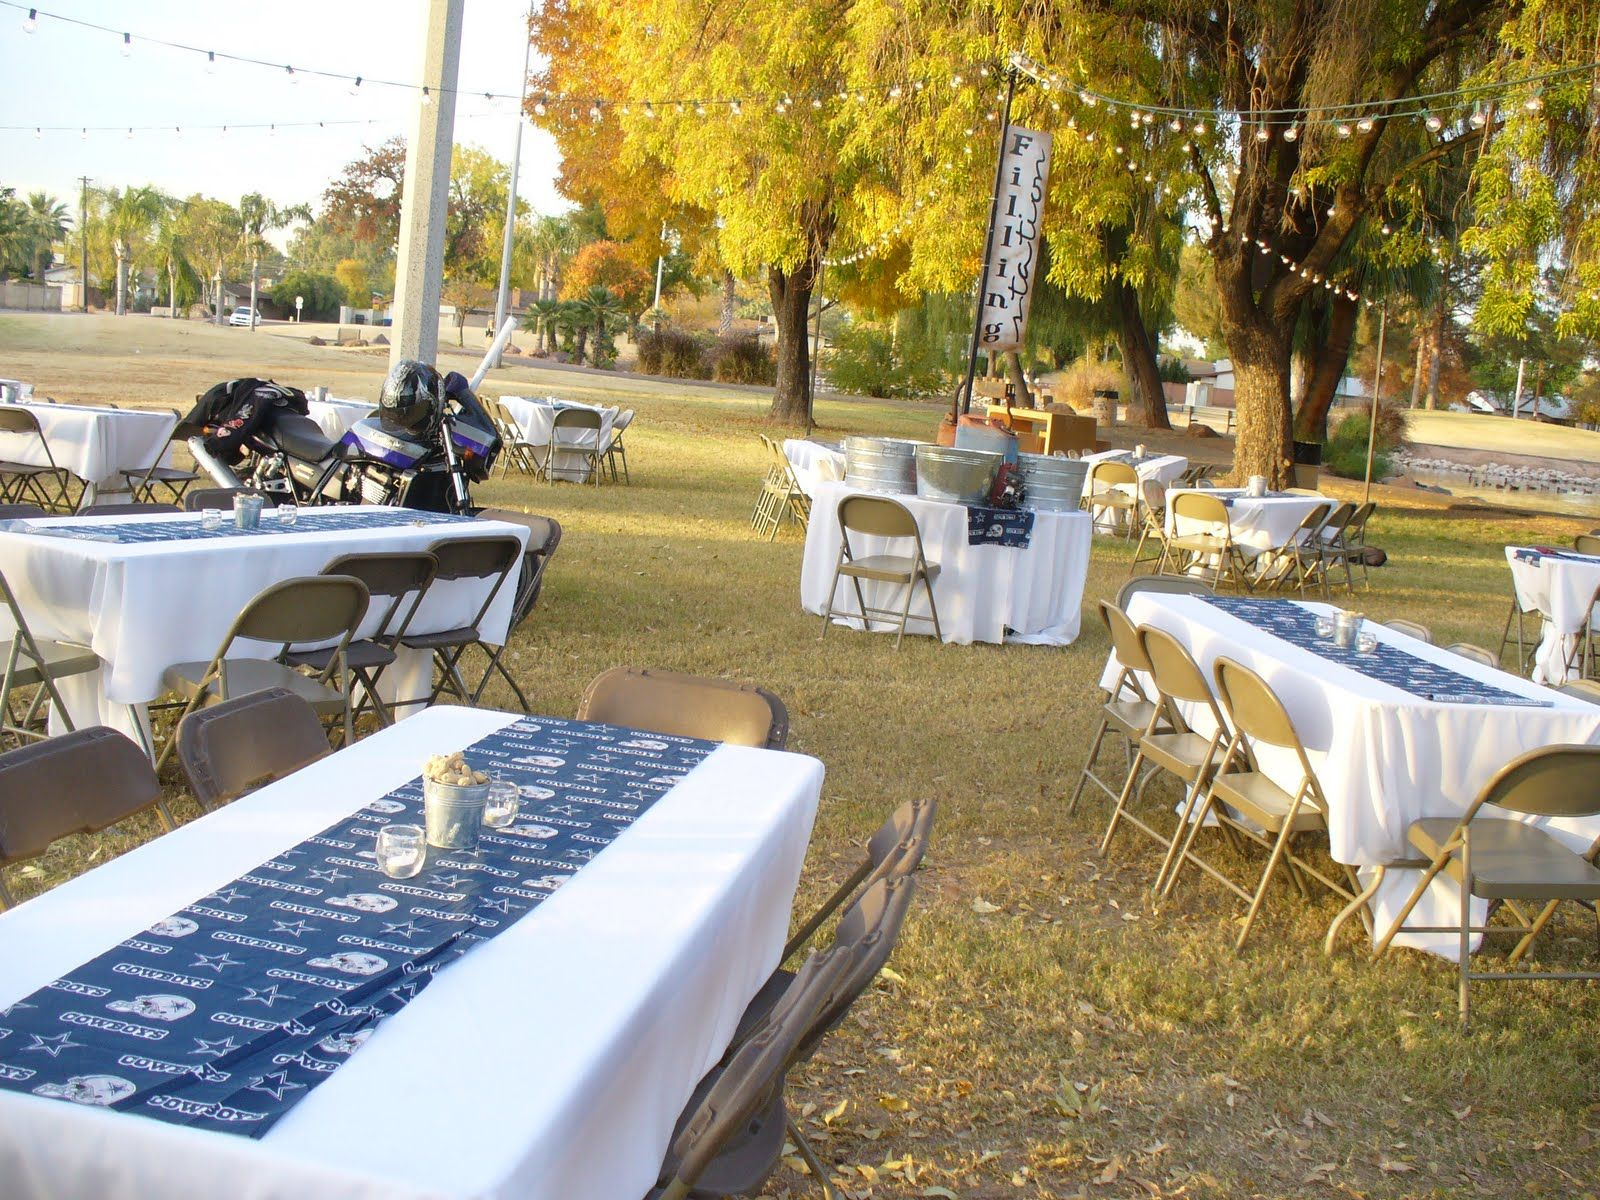 Dallas cowboys party decor google search cowboys party dallas cowboys party decor google search junglespirit Images